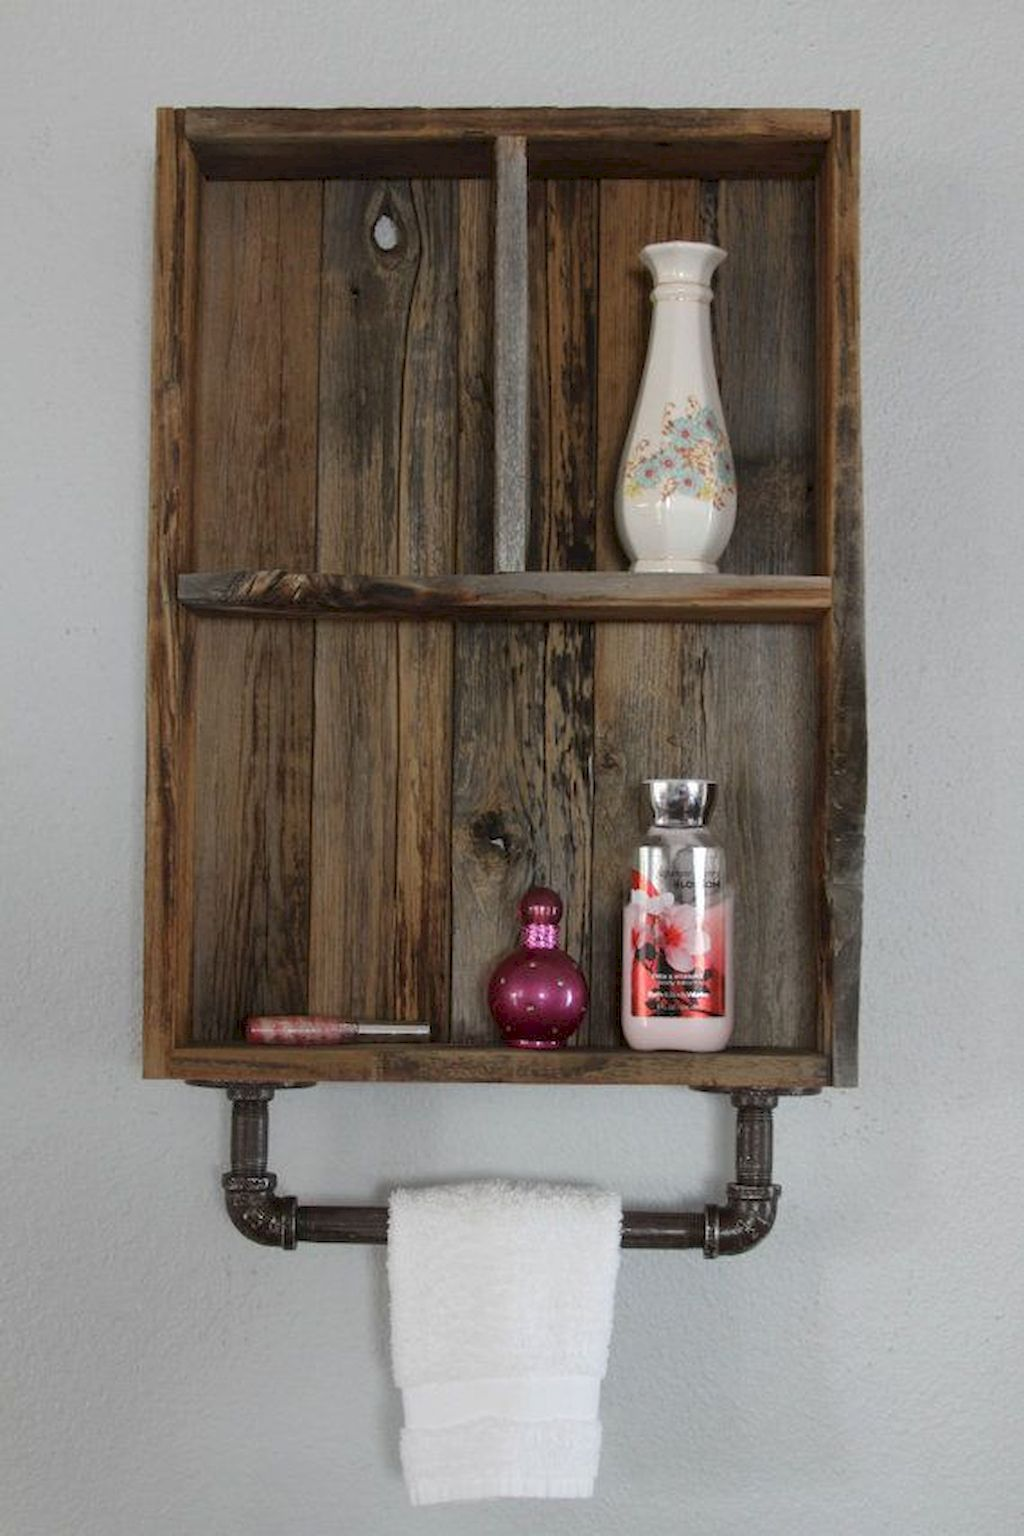 35 diy bathroom shelf ideas from wood pallets reclaimed